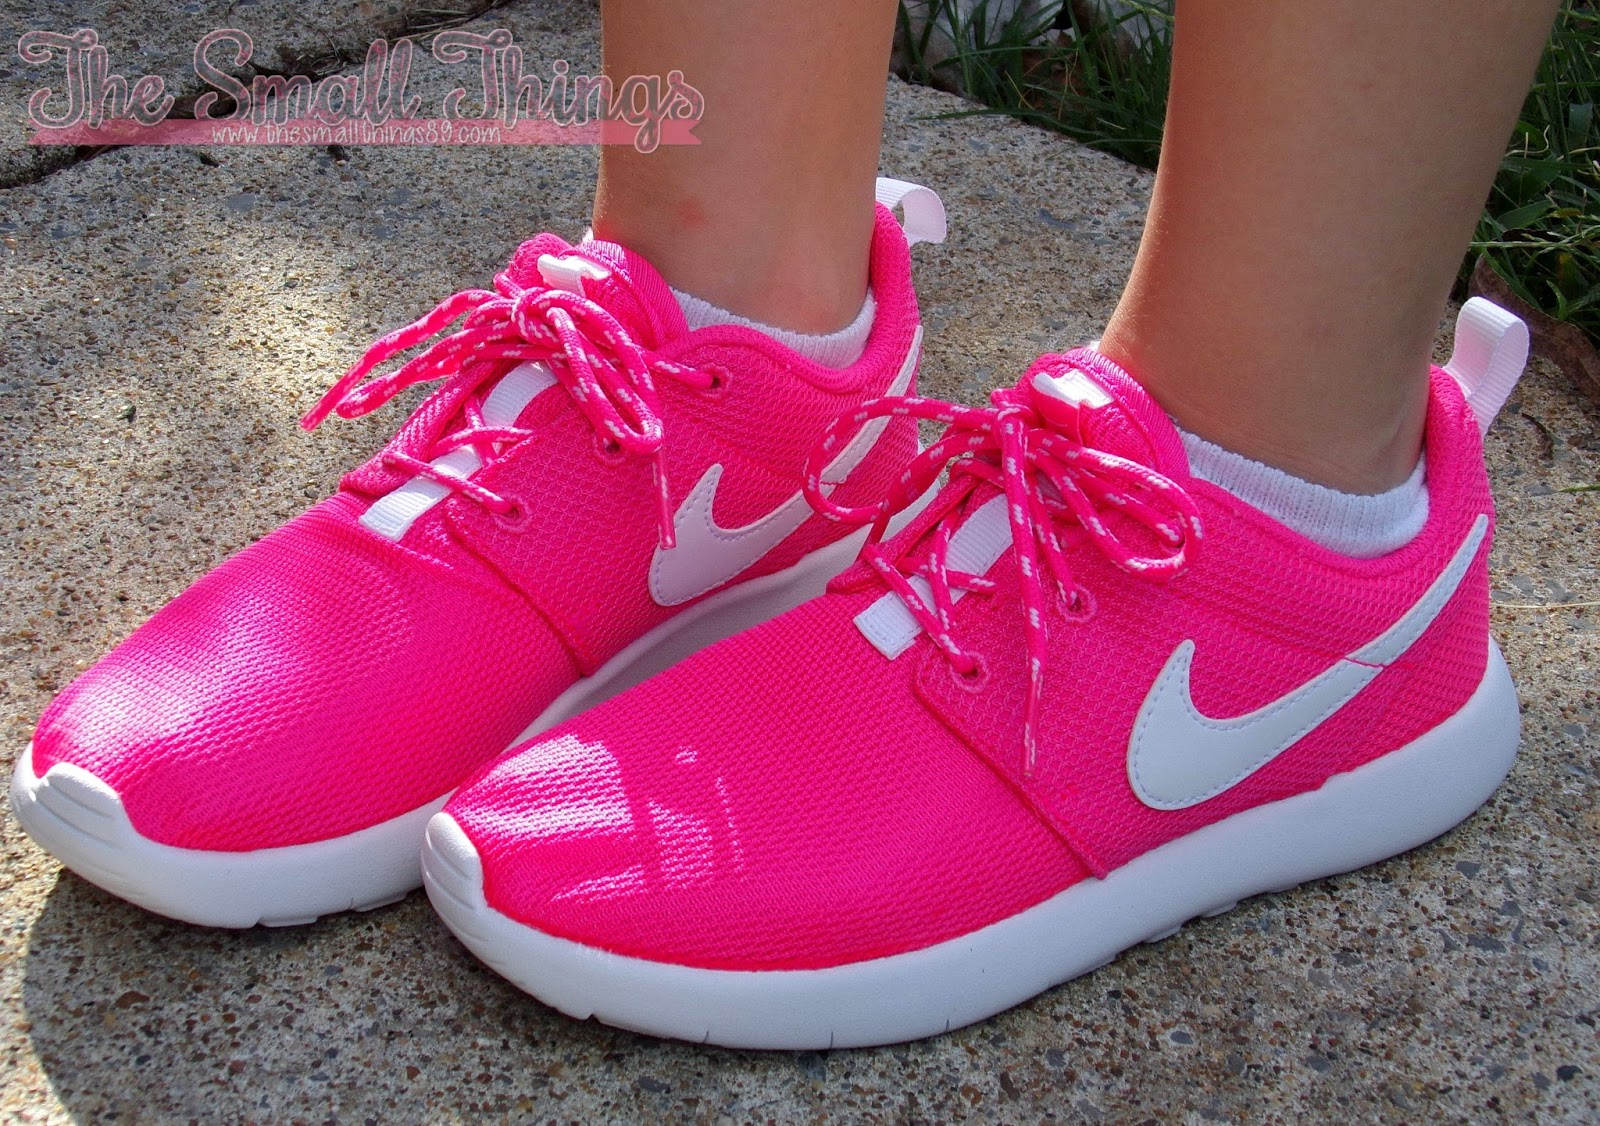 Kids Foot Locker- Back To School In Style With Nike Roche One